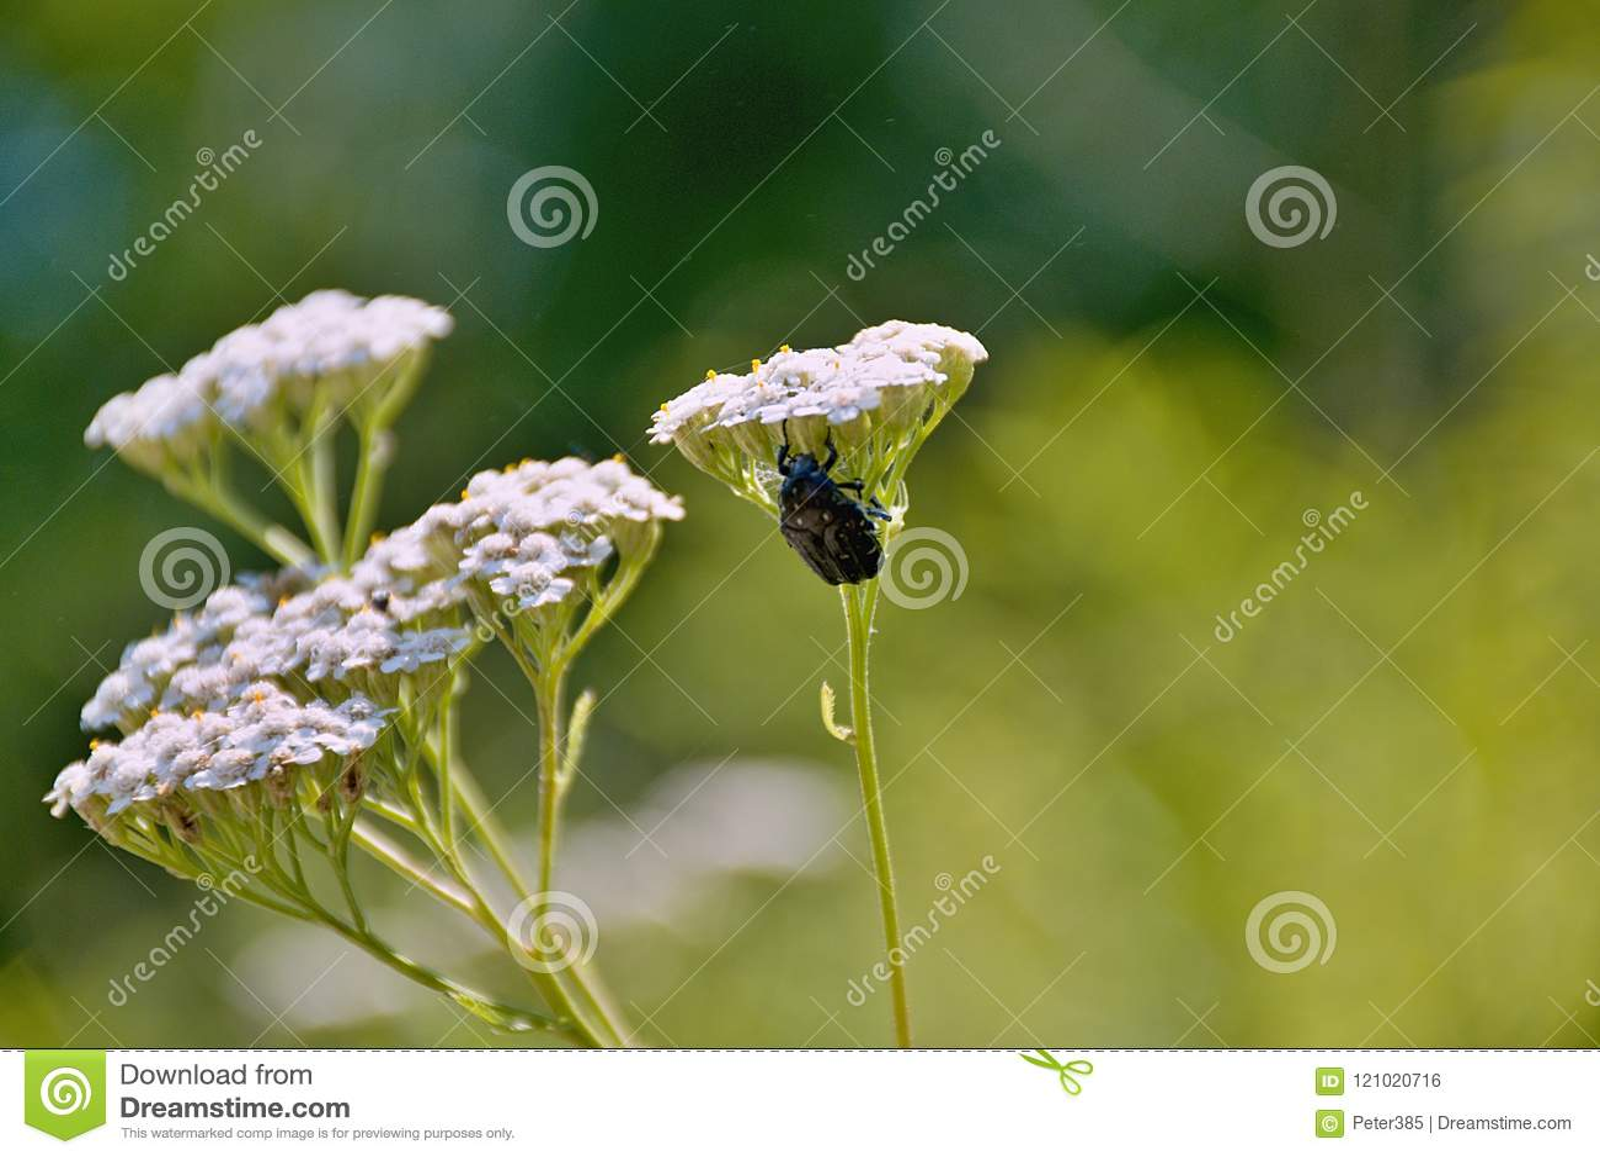 Download Big Black Beetle - White Flower Stock Photo - Image of water, brown: 121020716